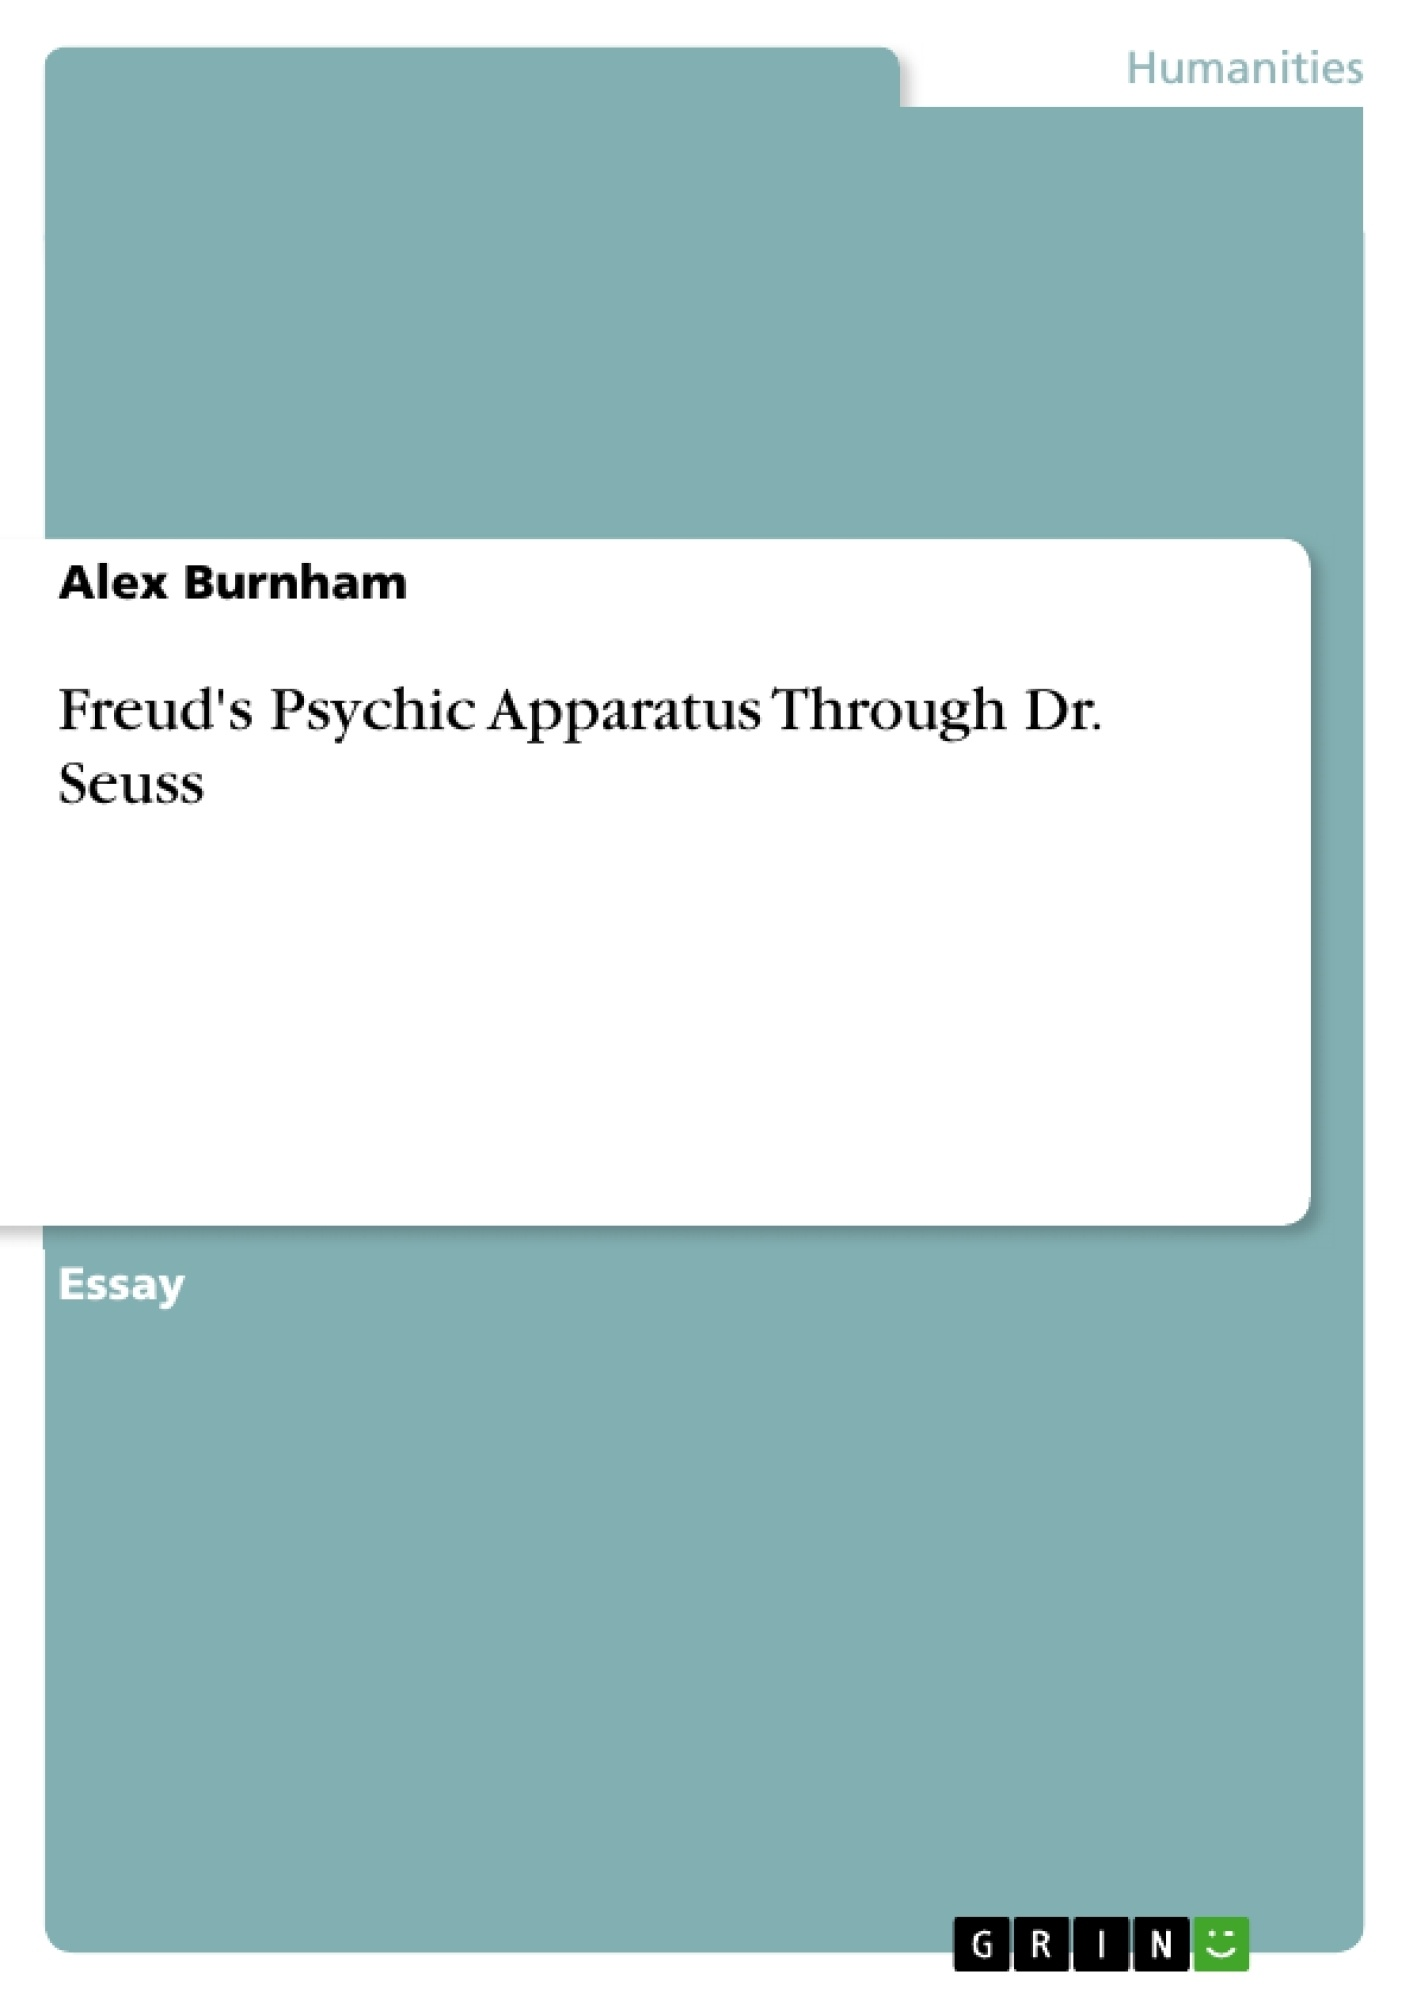 Title: Freud's Psychic Apparatus Through Dr. Seuss